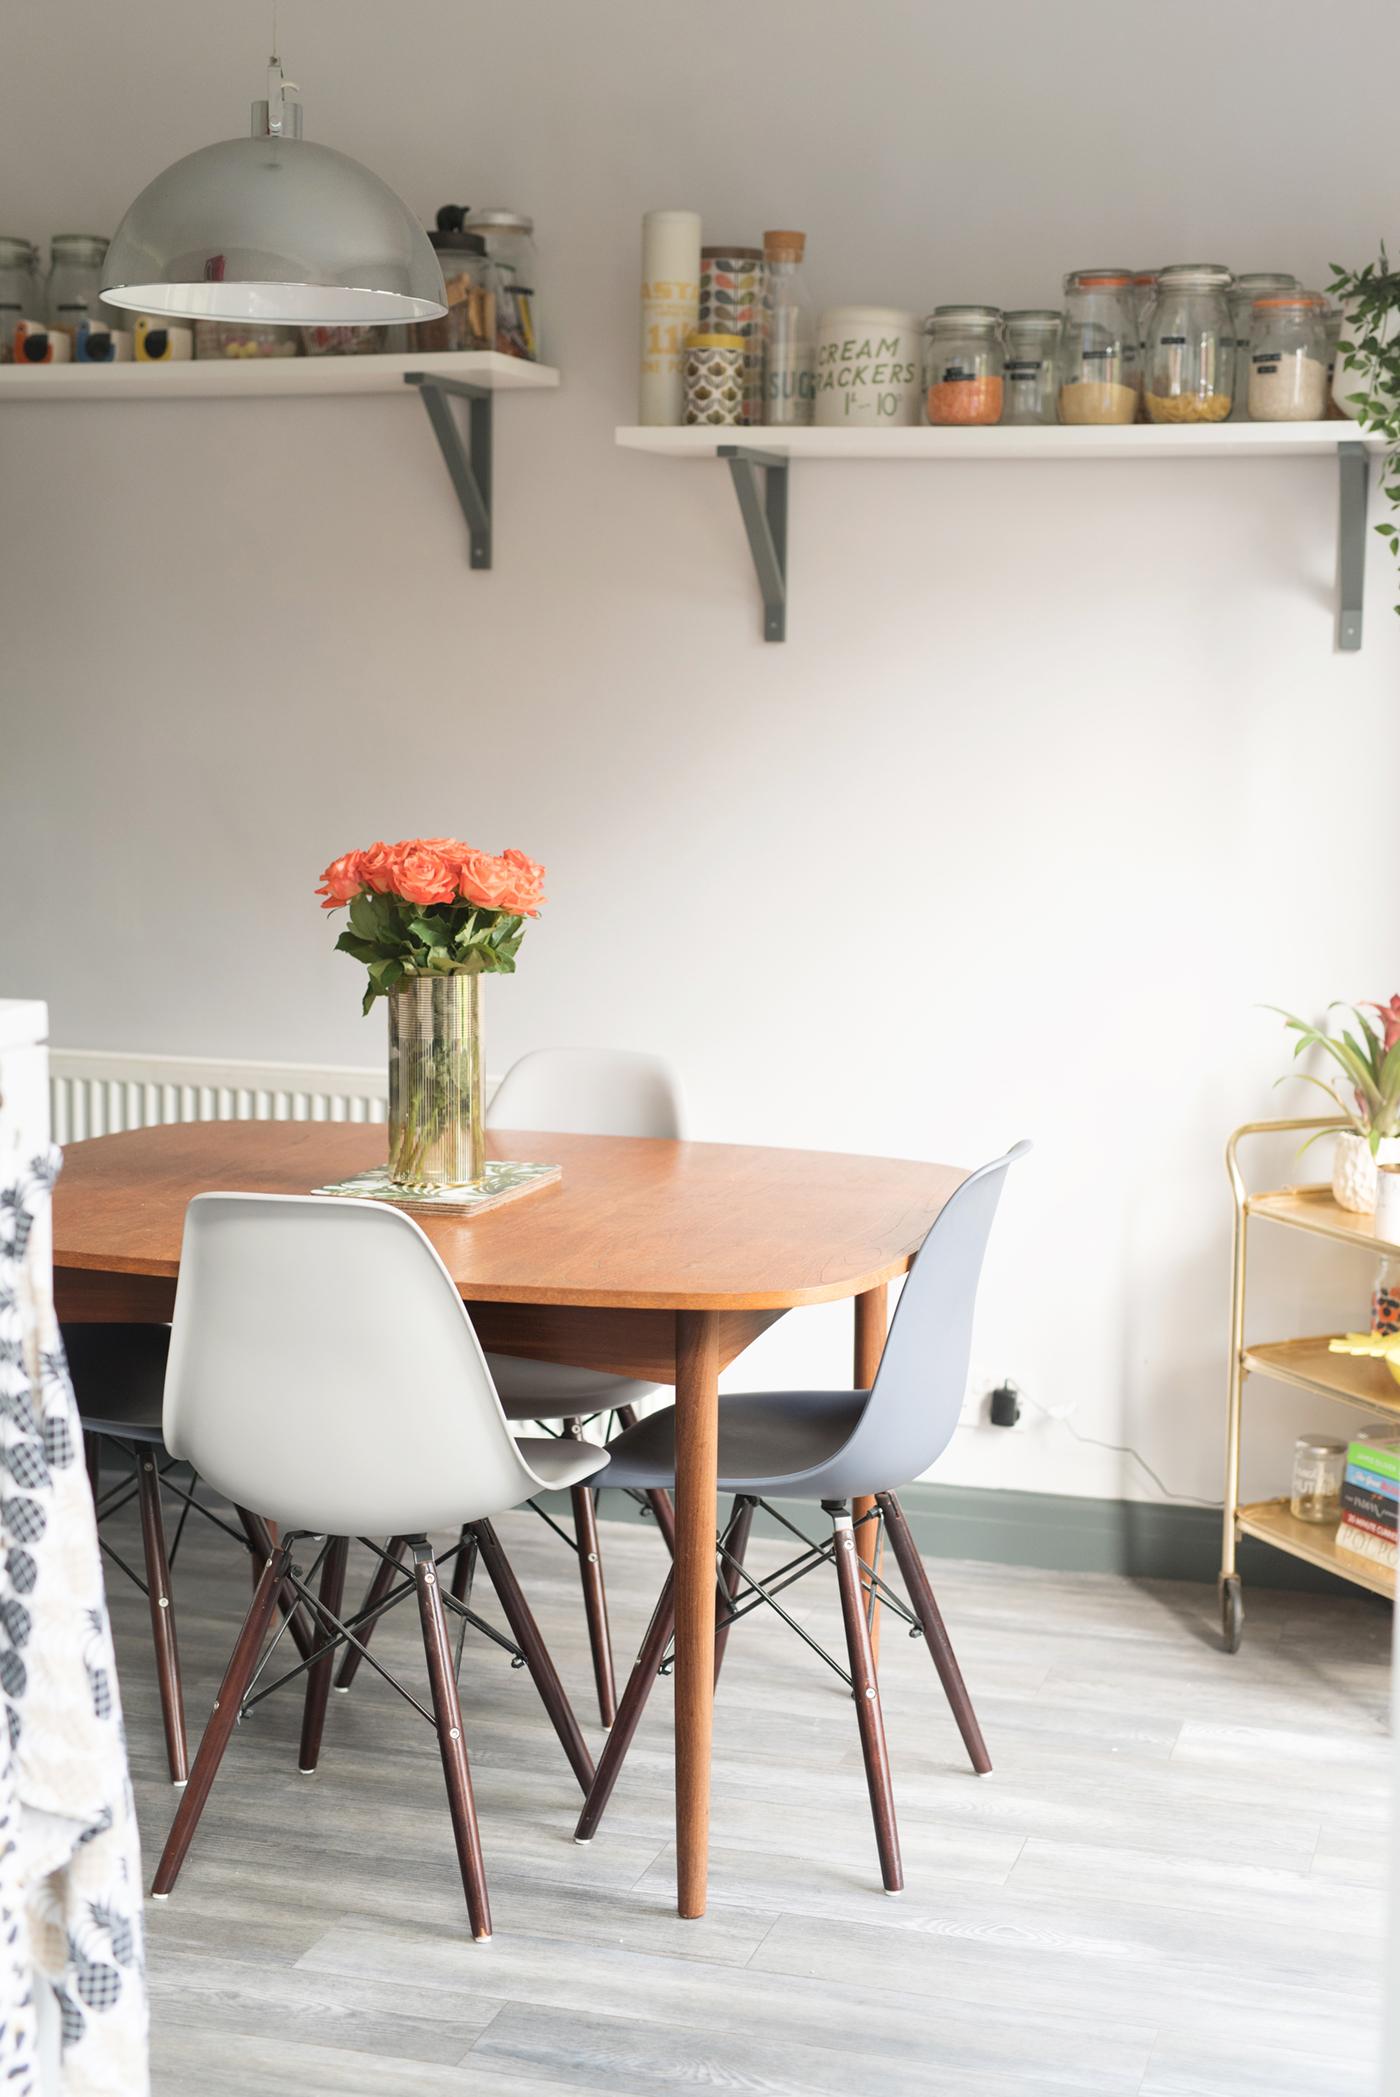 Retro kitchen diner decor